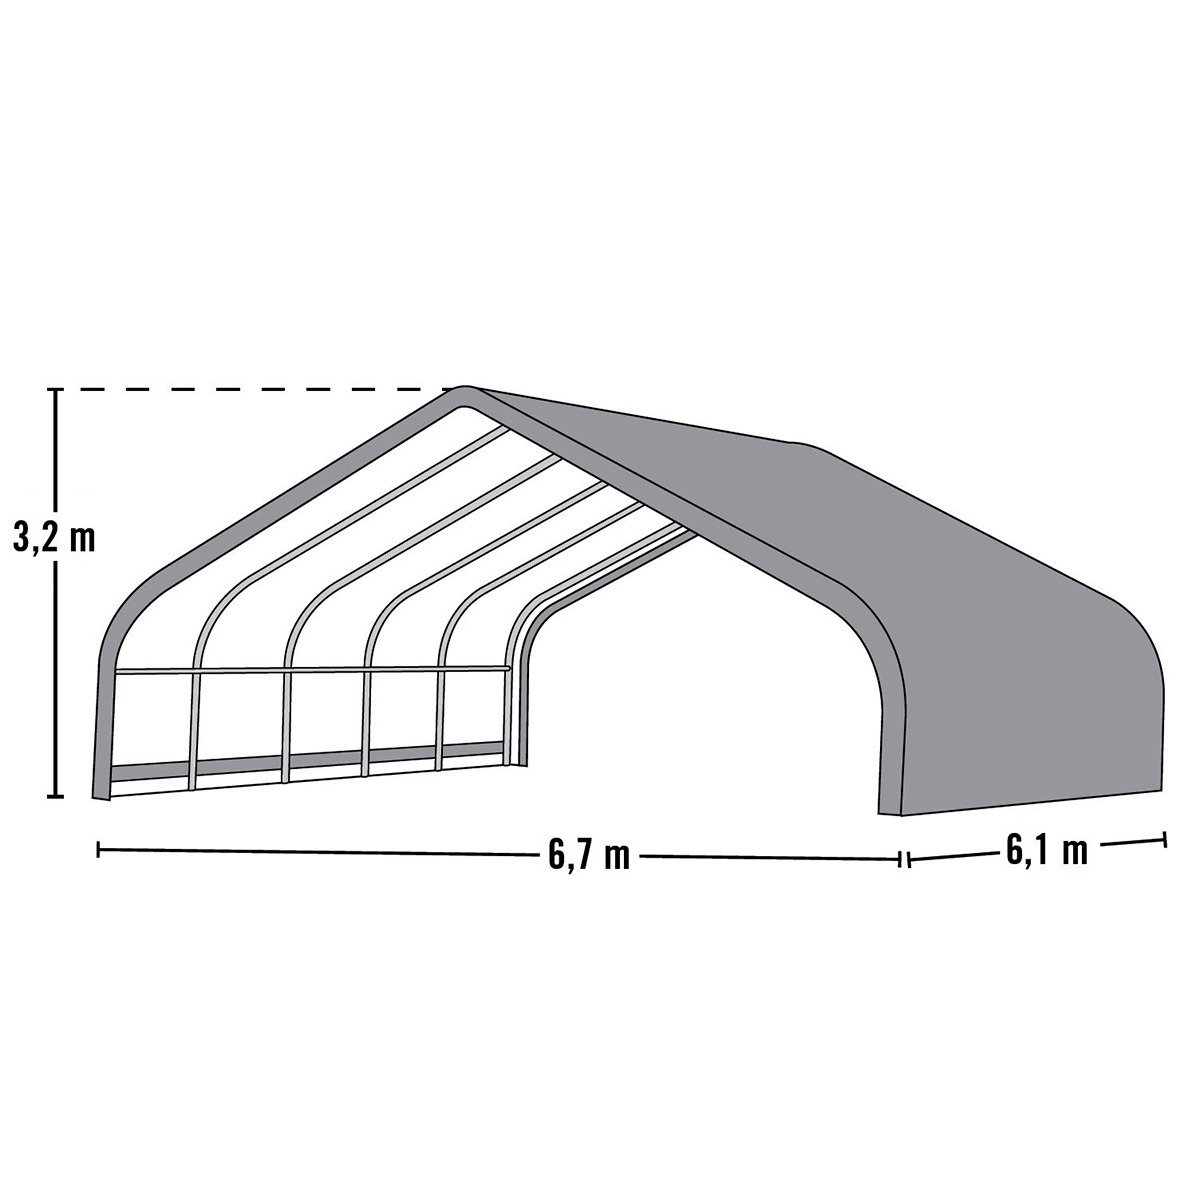 ShelterLogic Weidezelt Run-in-Shed 40,87m² inkl. Sturmanker   #5